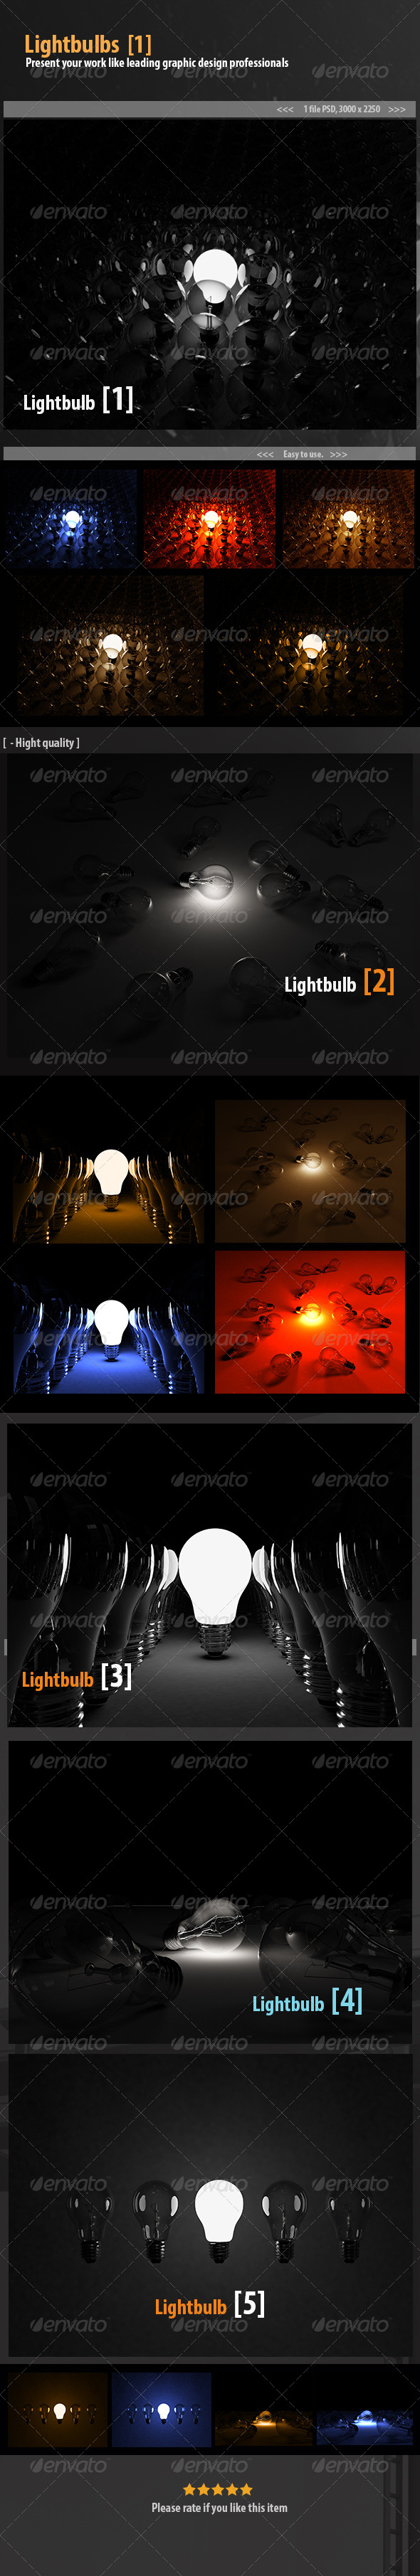 Lightbulbs - 3D Backgrounds